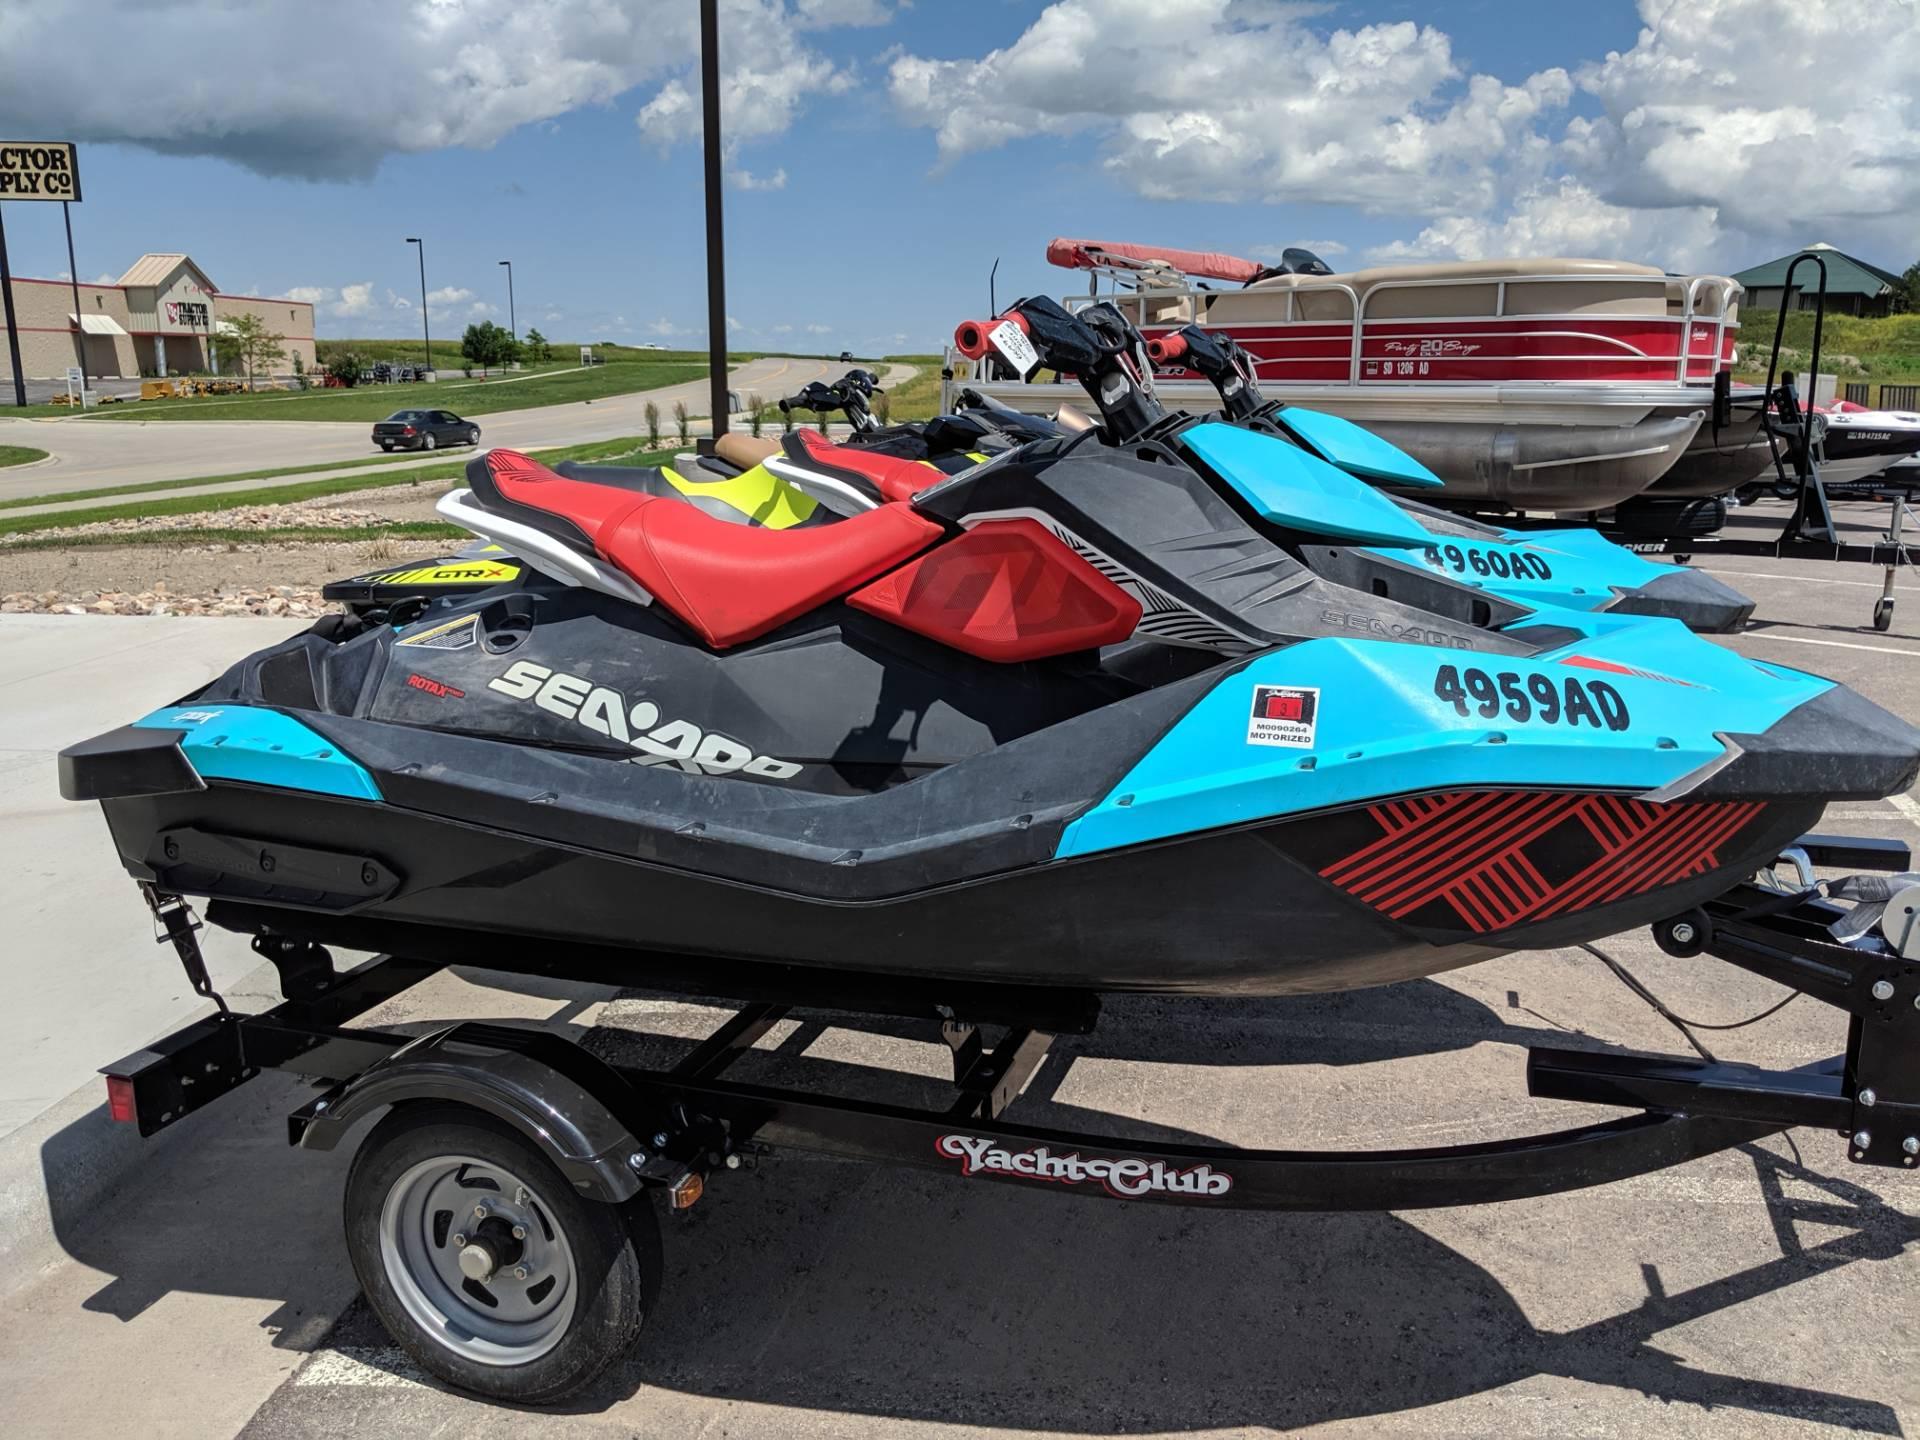 2017 Sea-Doo Spark 2up Trixx iBR for sale 153351